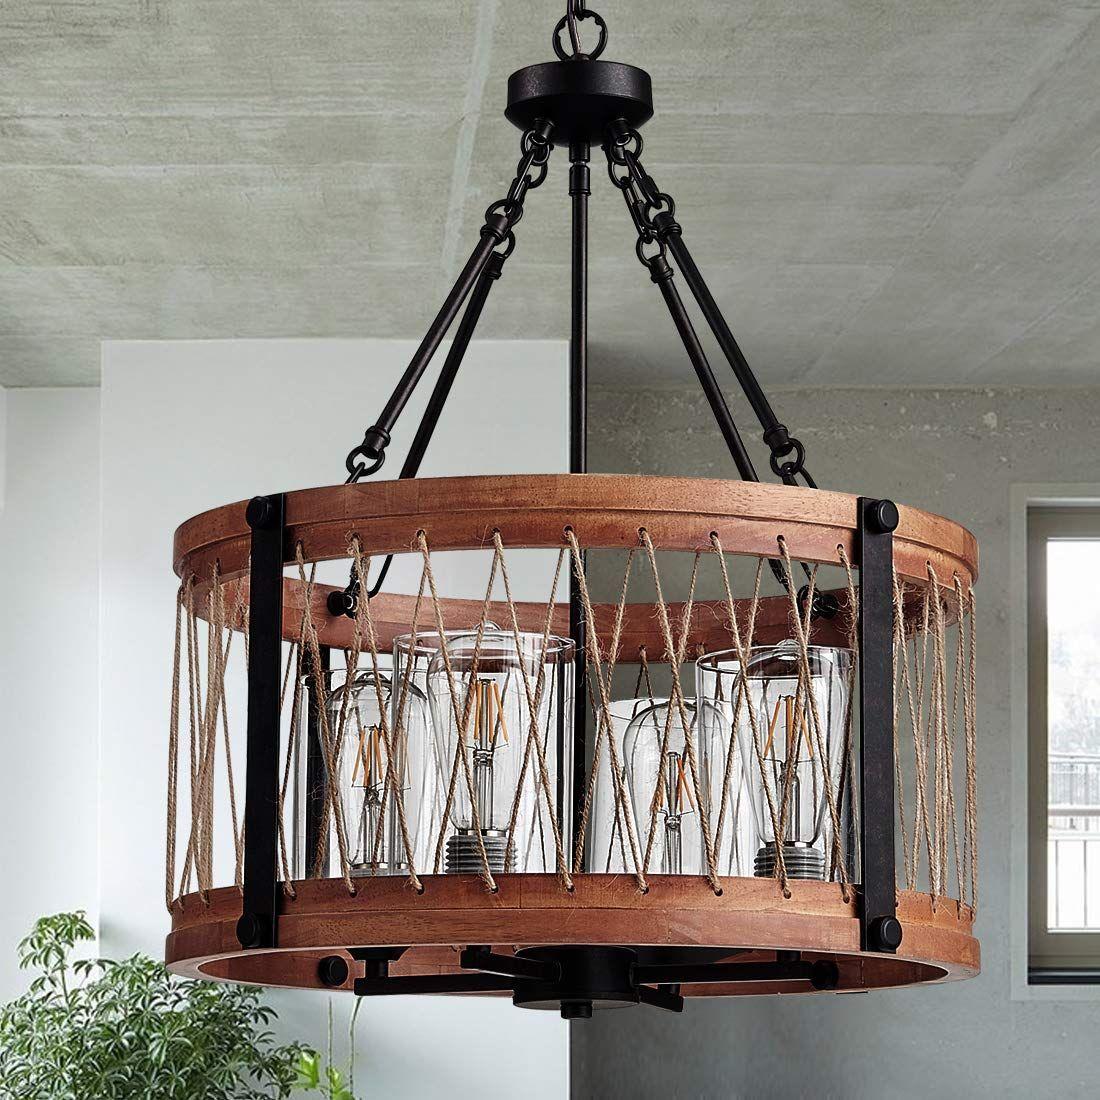 Wooden Chandelier Led In 2020